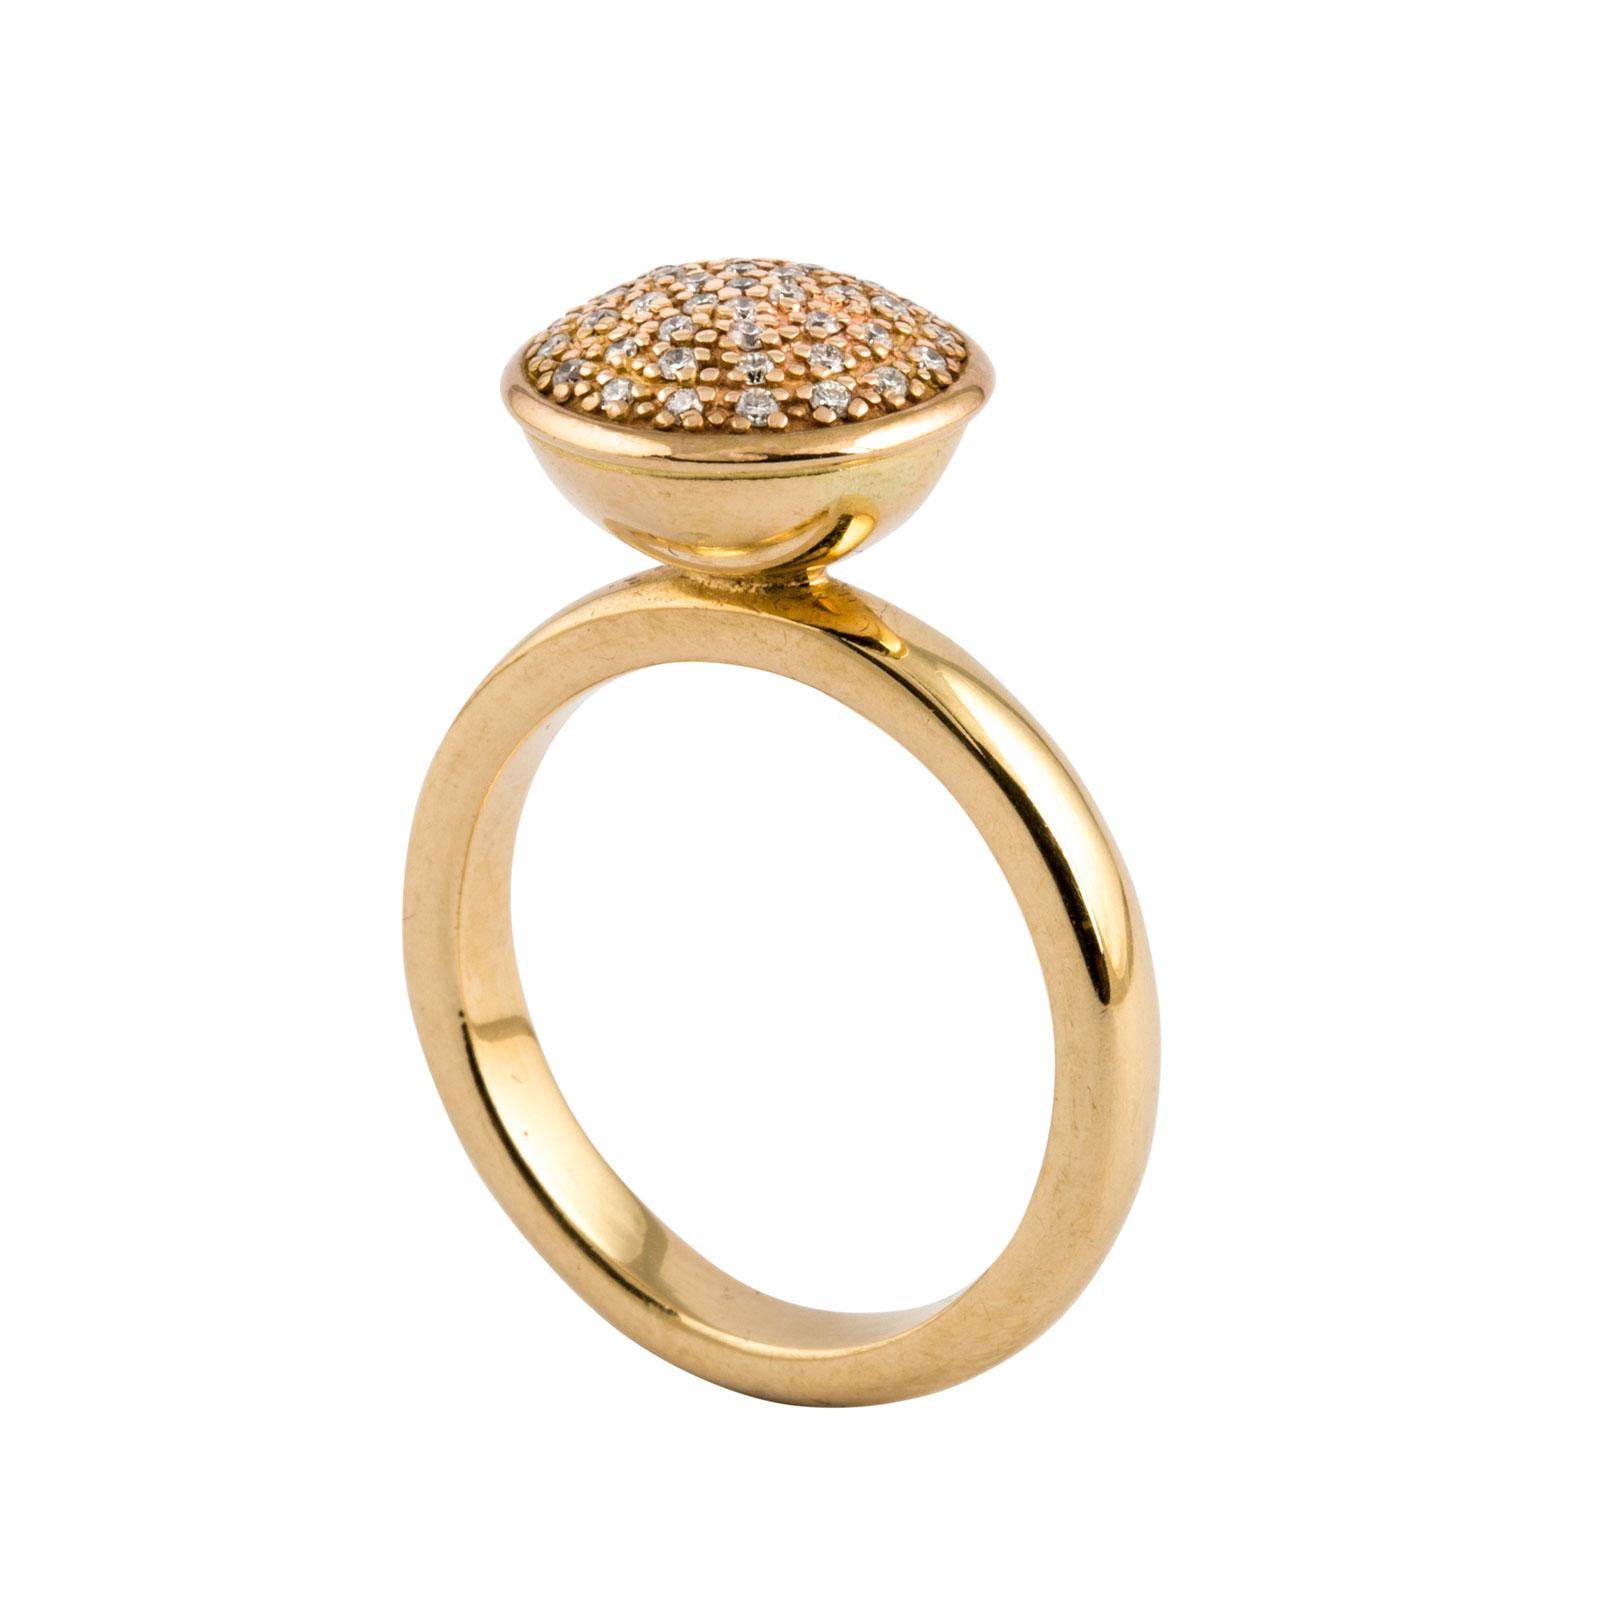 Lene Visholm packshots - guld-ringe